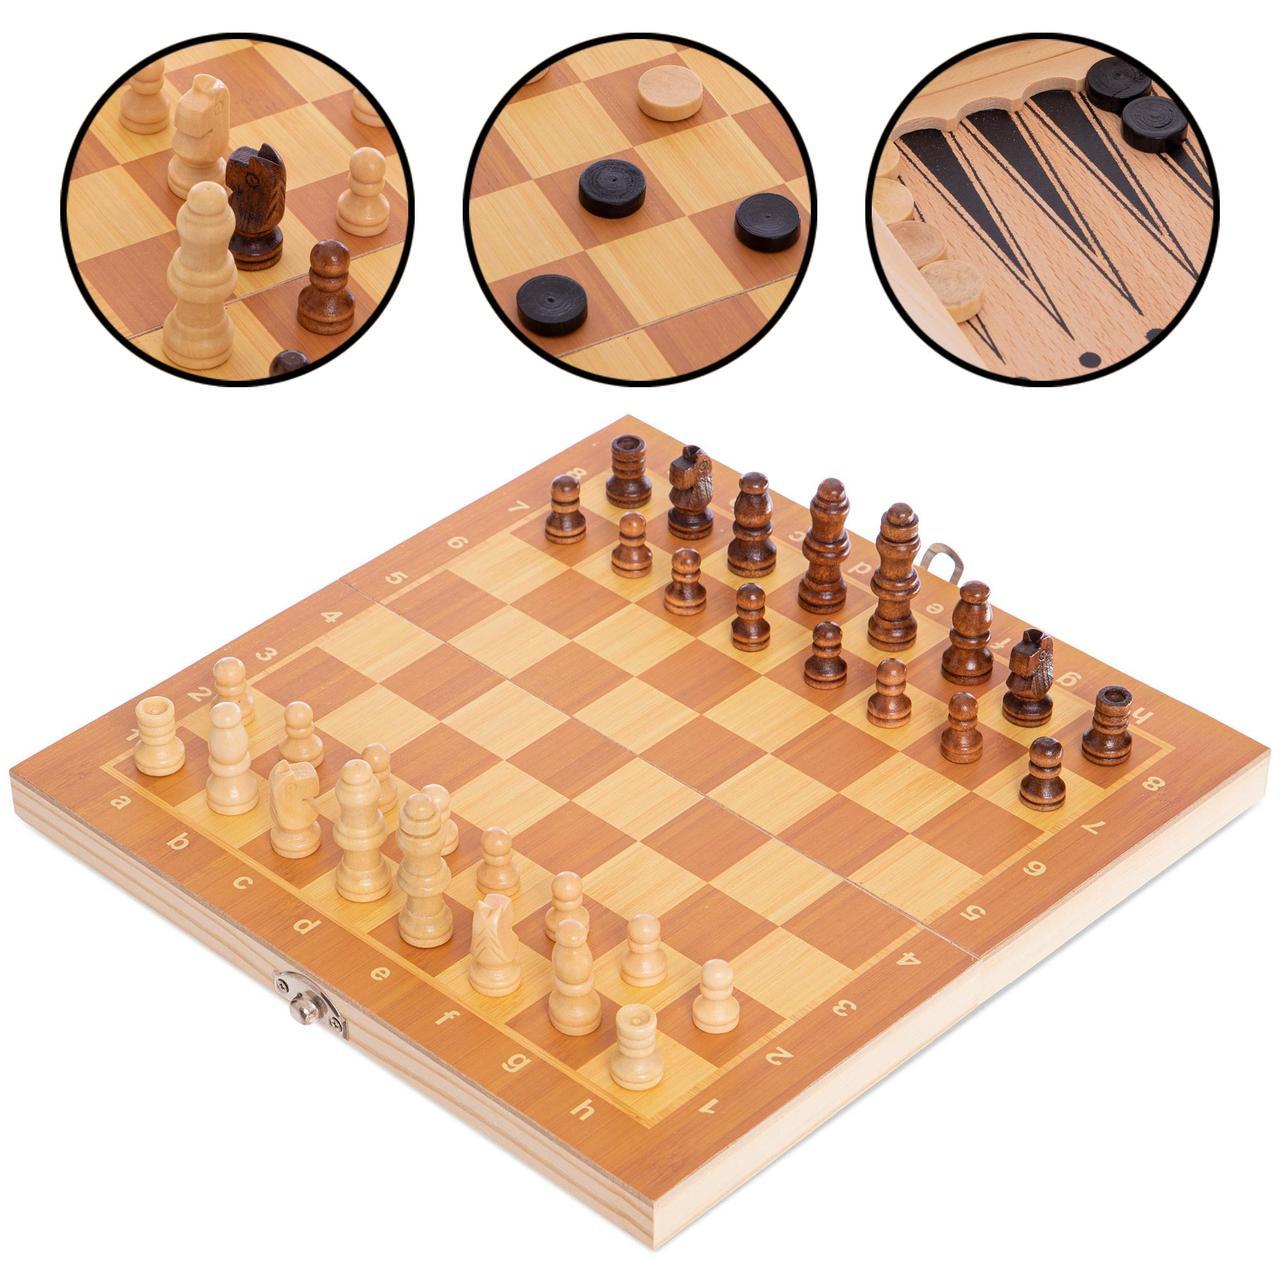 Шахматы, шашки, нарды 3 в 1 деревянные (29x29см) W7722